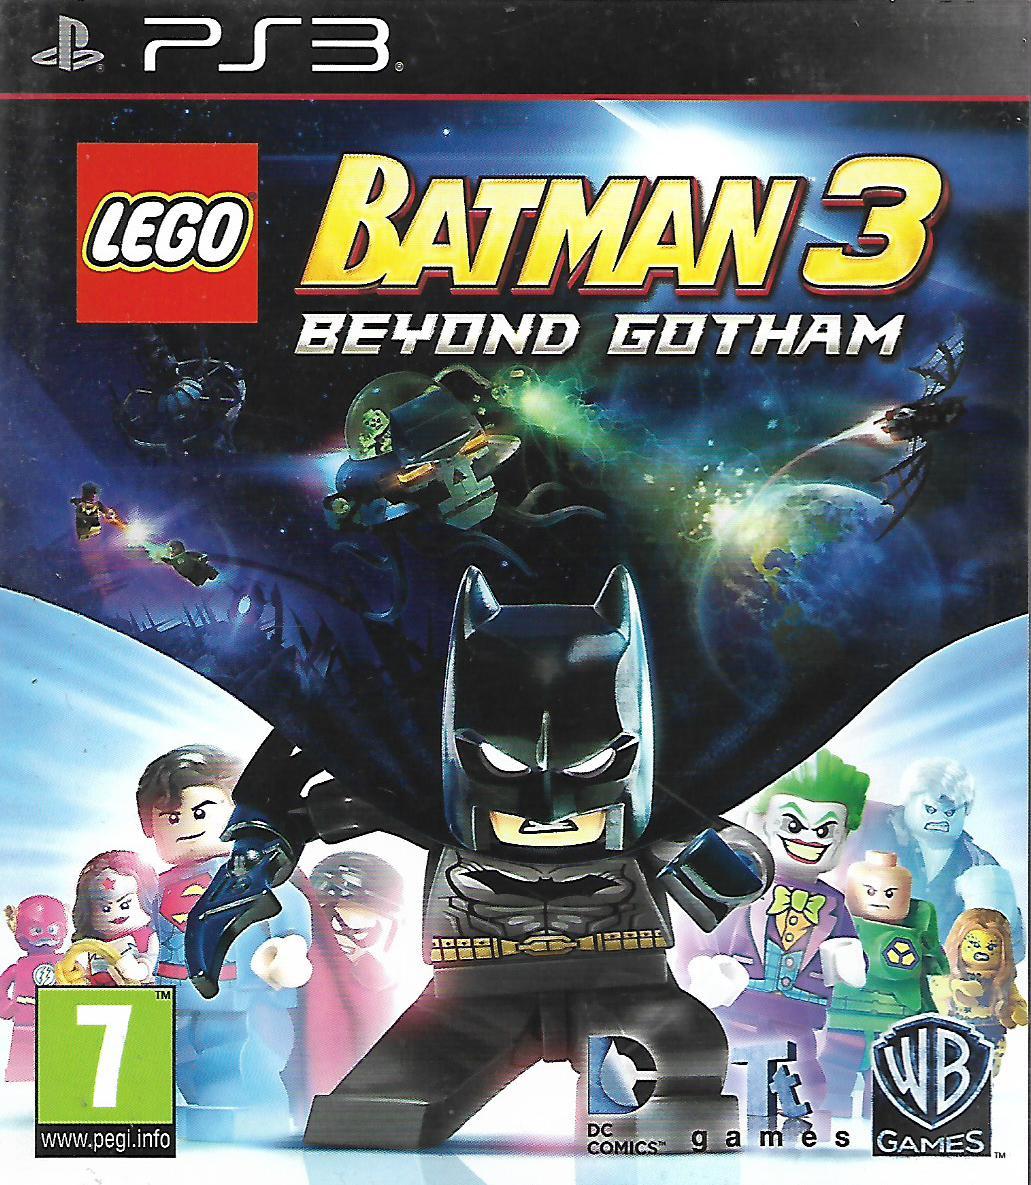 LEGO BATMAN 3 - BEYOND GOTHAM (PS3 - bazar)